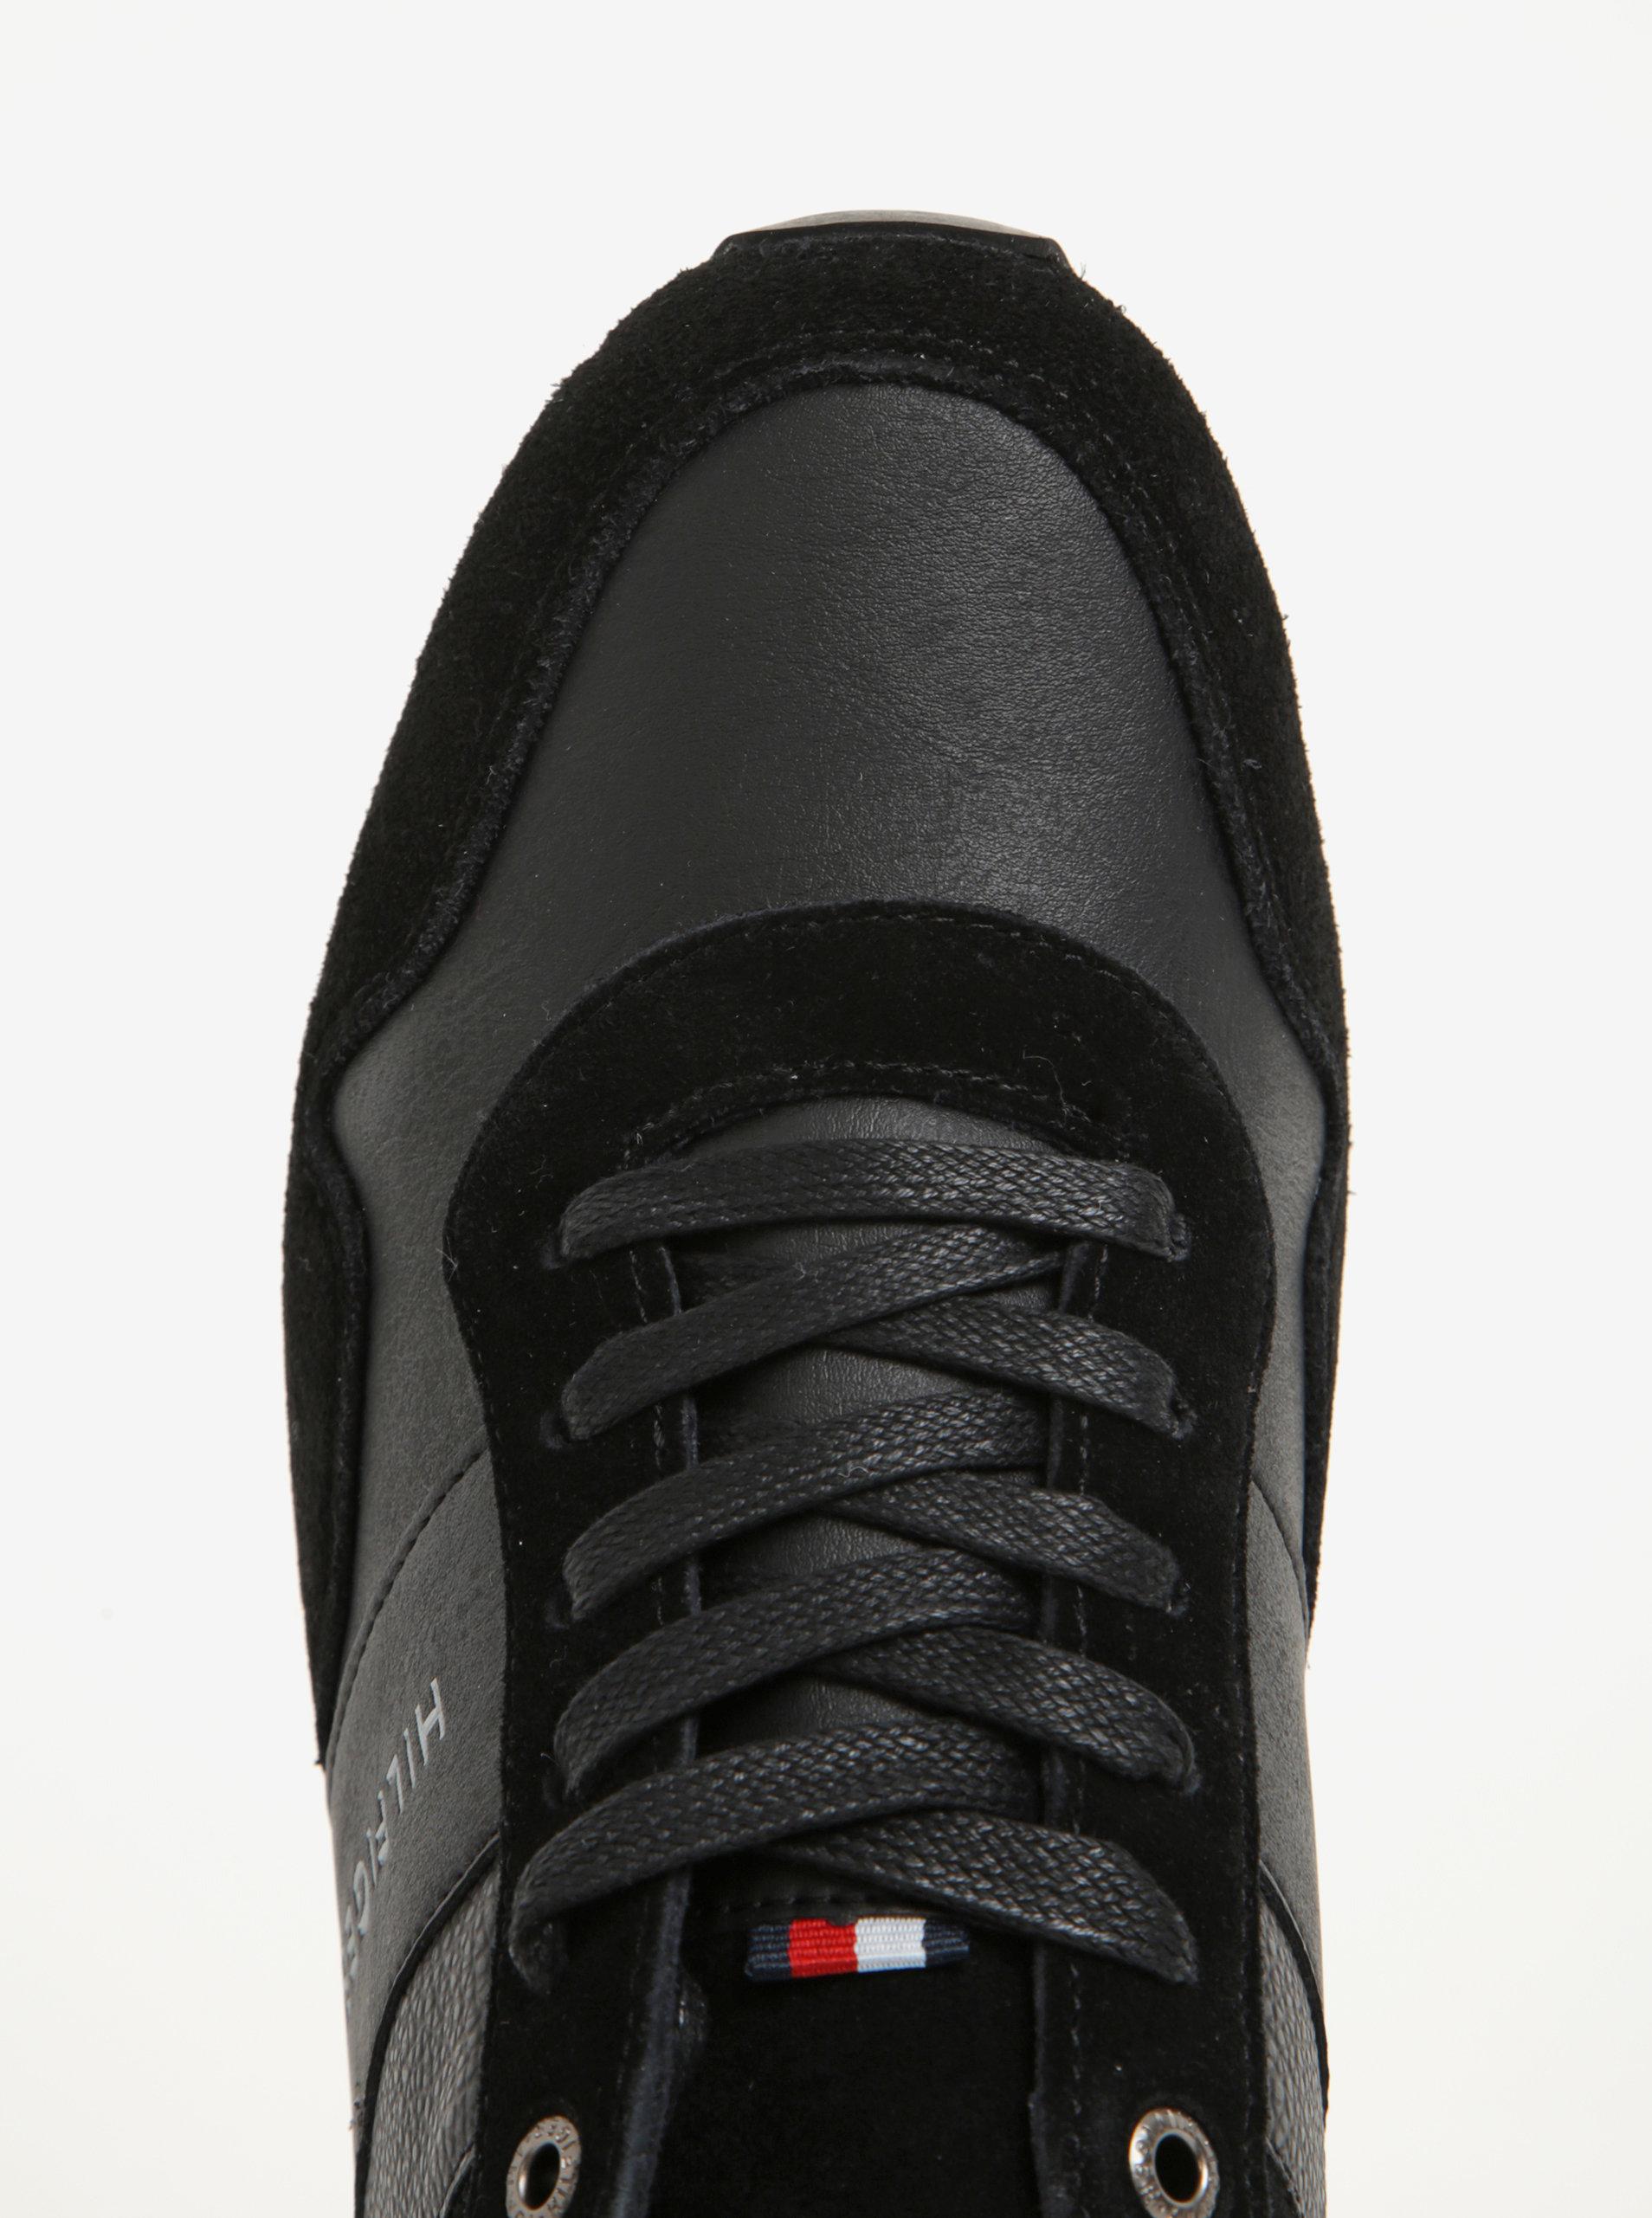 ab5d4865c4 Čierne pánske tenisky so semišovými detailmi Tommy Hilfiger Maxwell ...